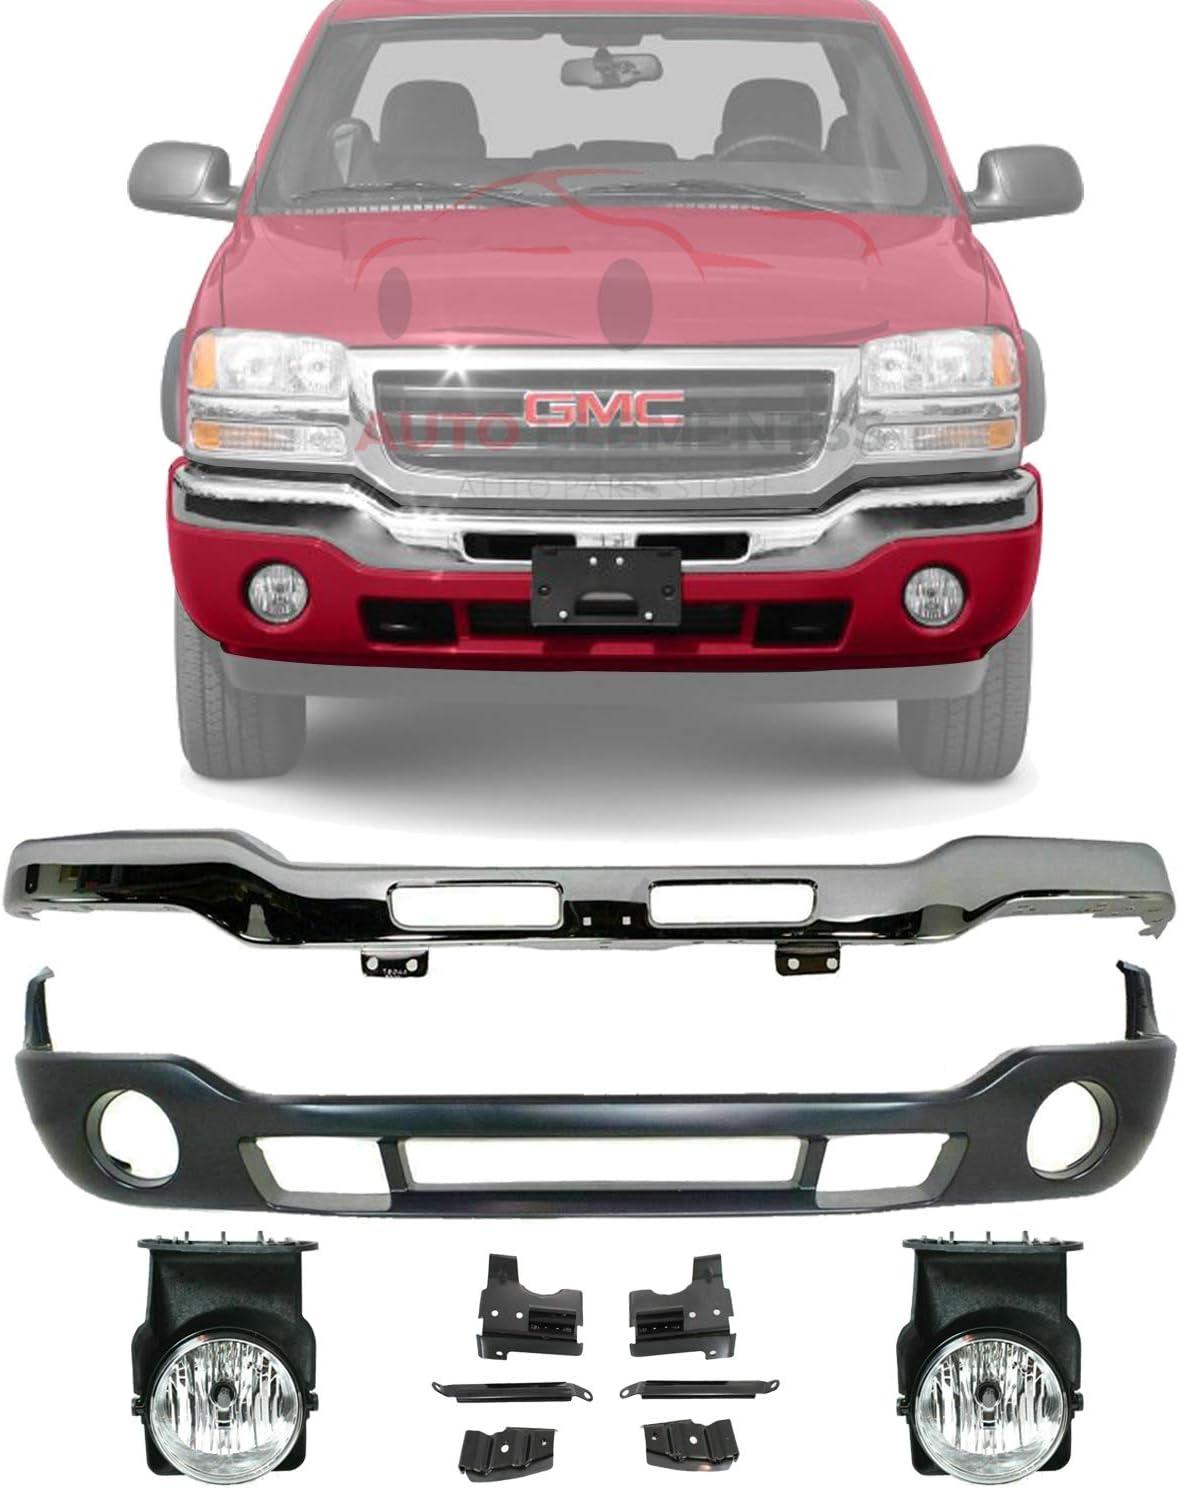 Buy New Front Bumper Chrome With Brackets Lower Valance Primed With Fog Light Holes Fog Light Left Driver Right Passenger Side For 2003 2006 Gmc Sierra 1500 2500hd 3500 Direct